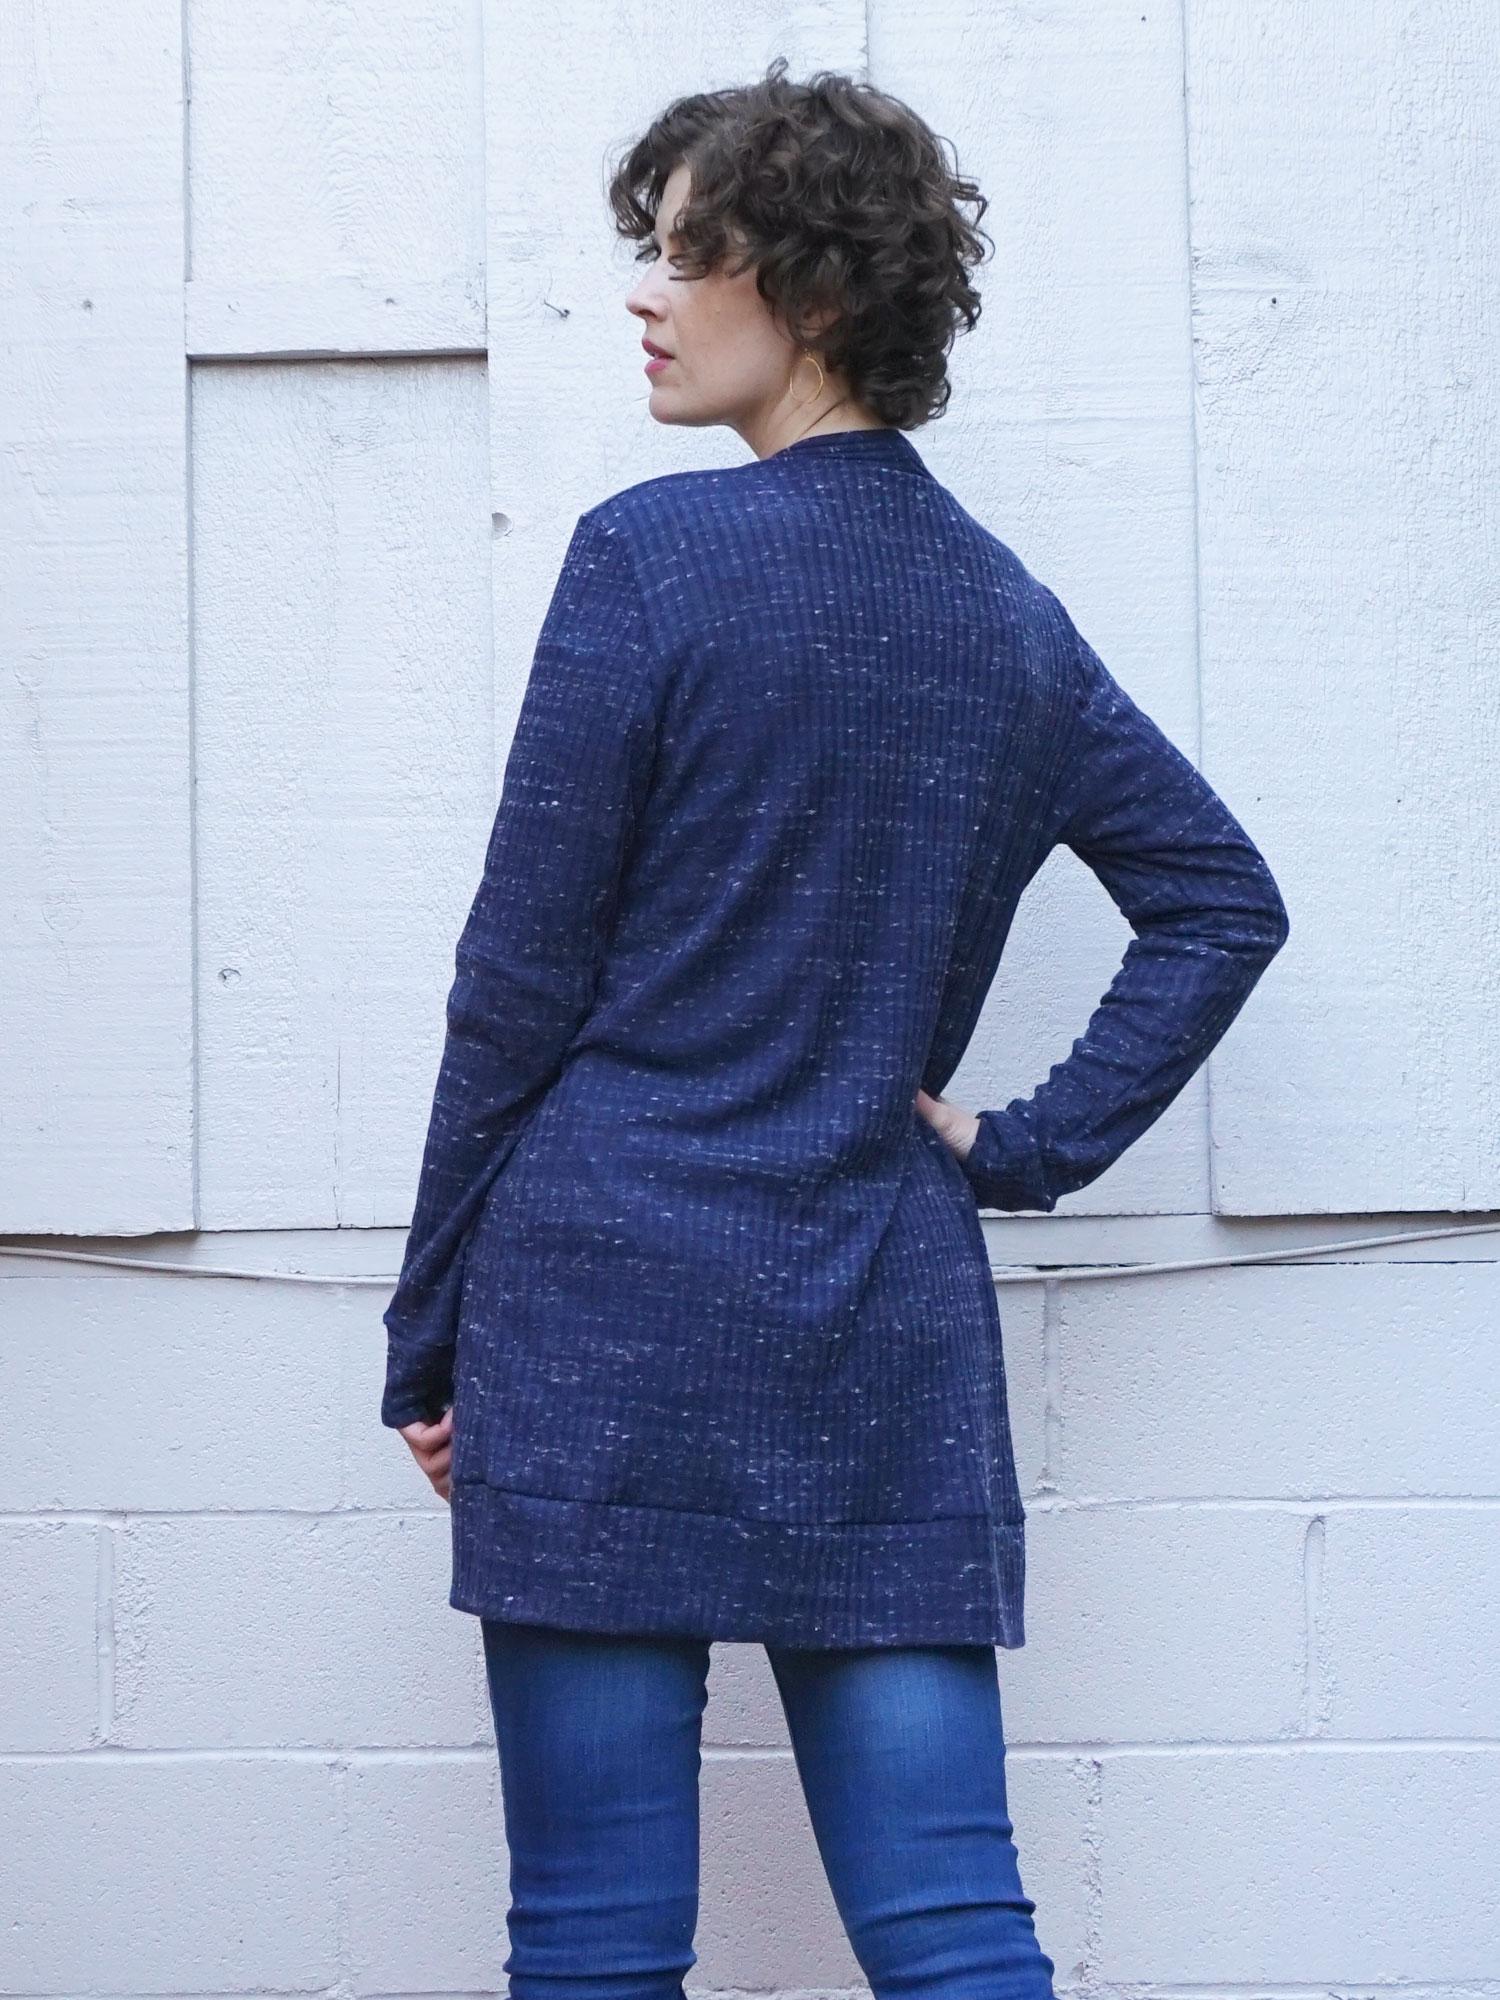 DIY Layering Cardigan – The Blackwood Cardigan by Helen's Closet | Sew DIY